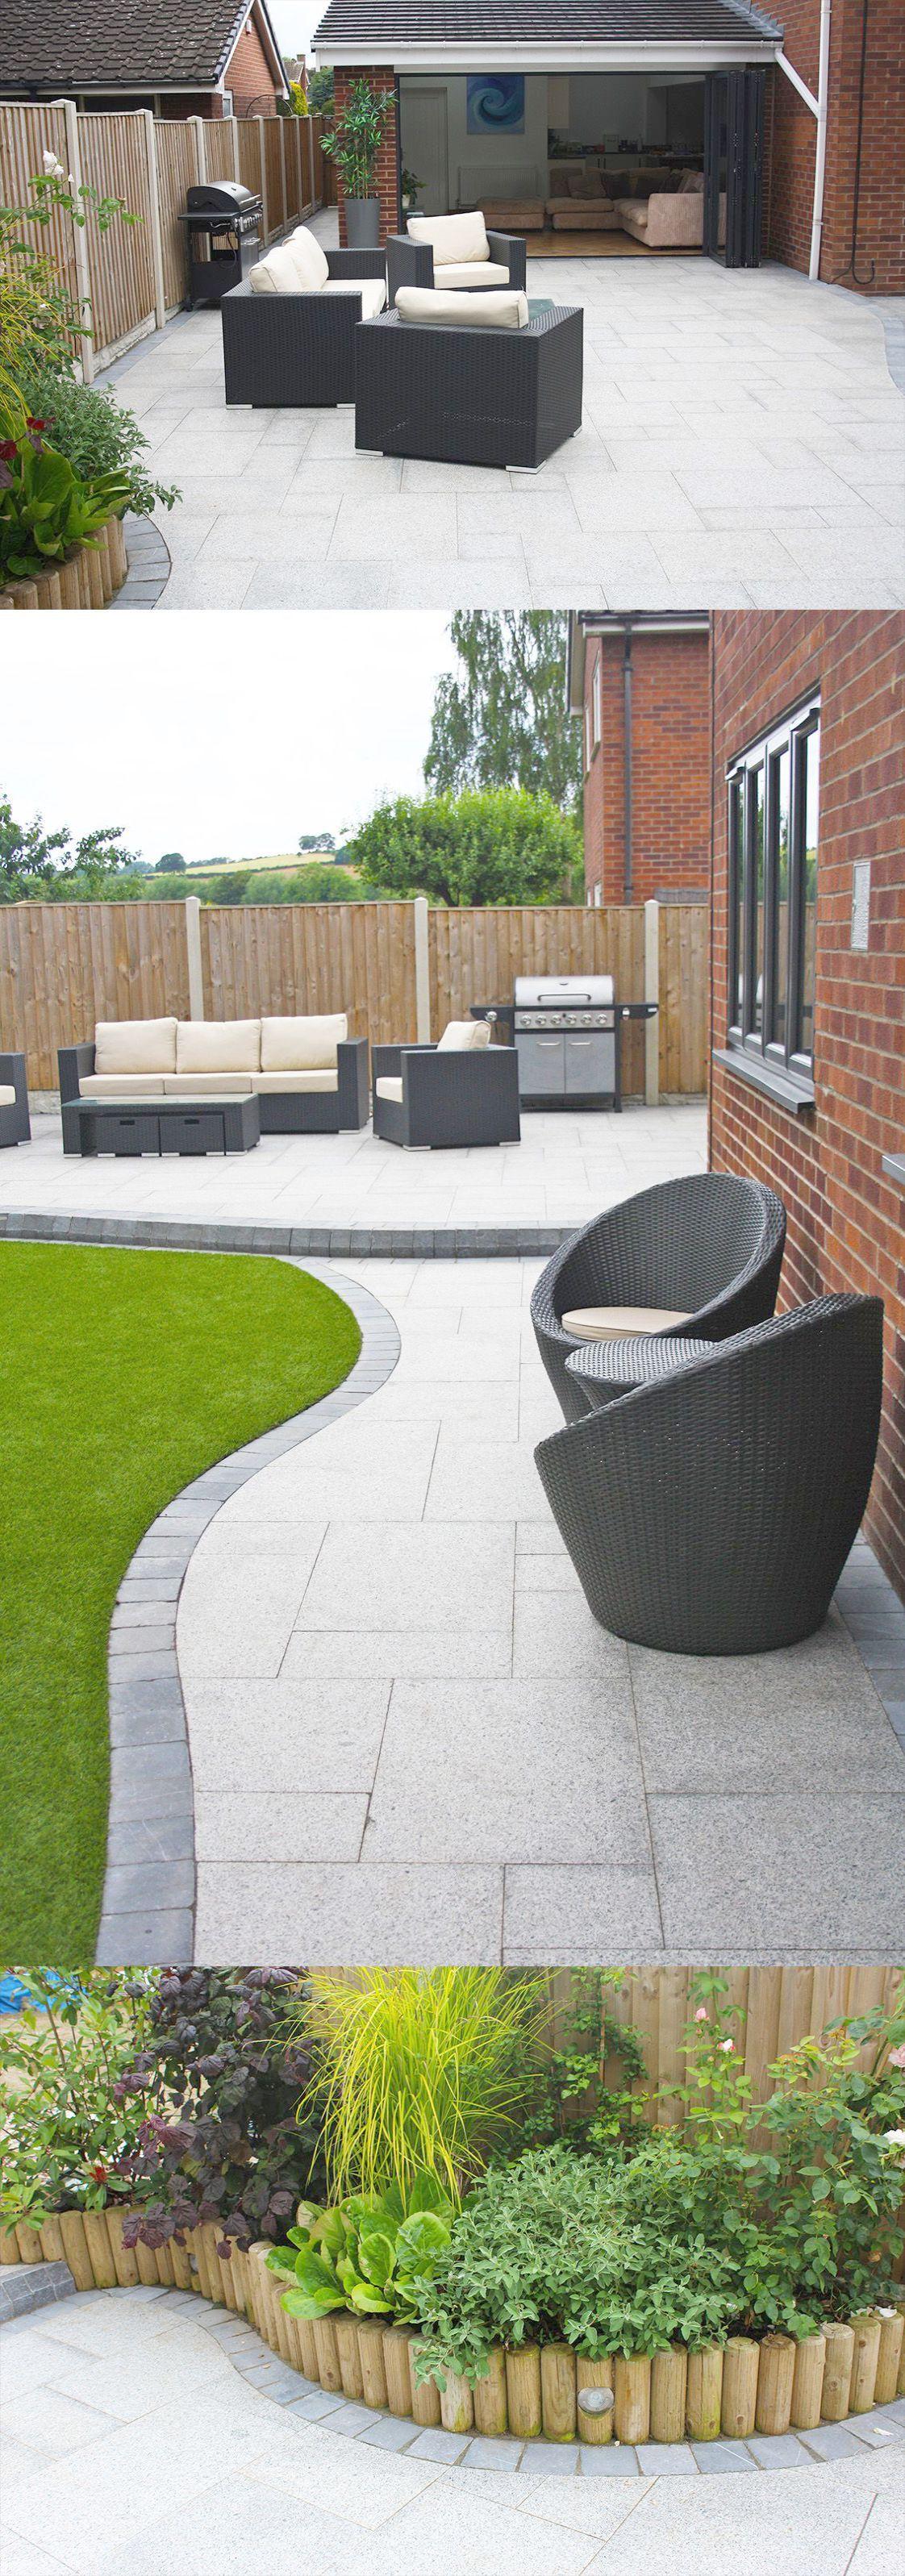 Landscape Gardening Luton Landscape Gardening Jobs Peterborough Modern Landscaping Patio Garden Patio Stones